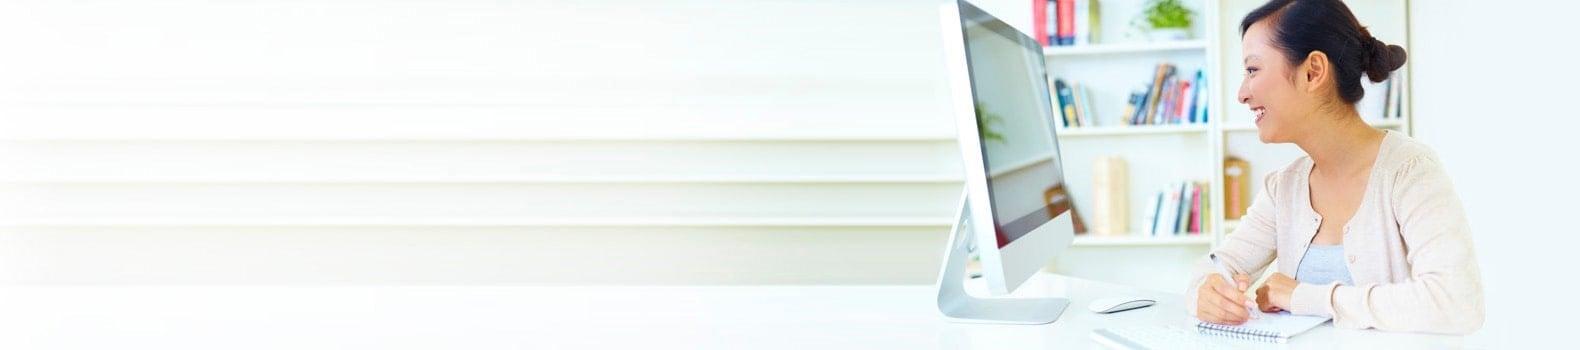 Hk borrow virtual planner right product masthead